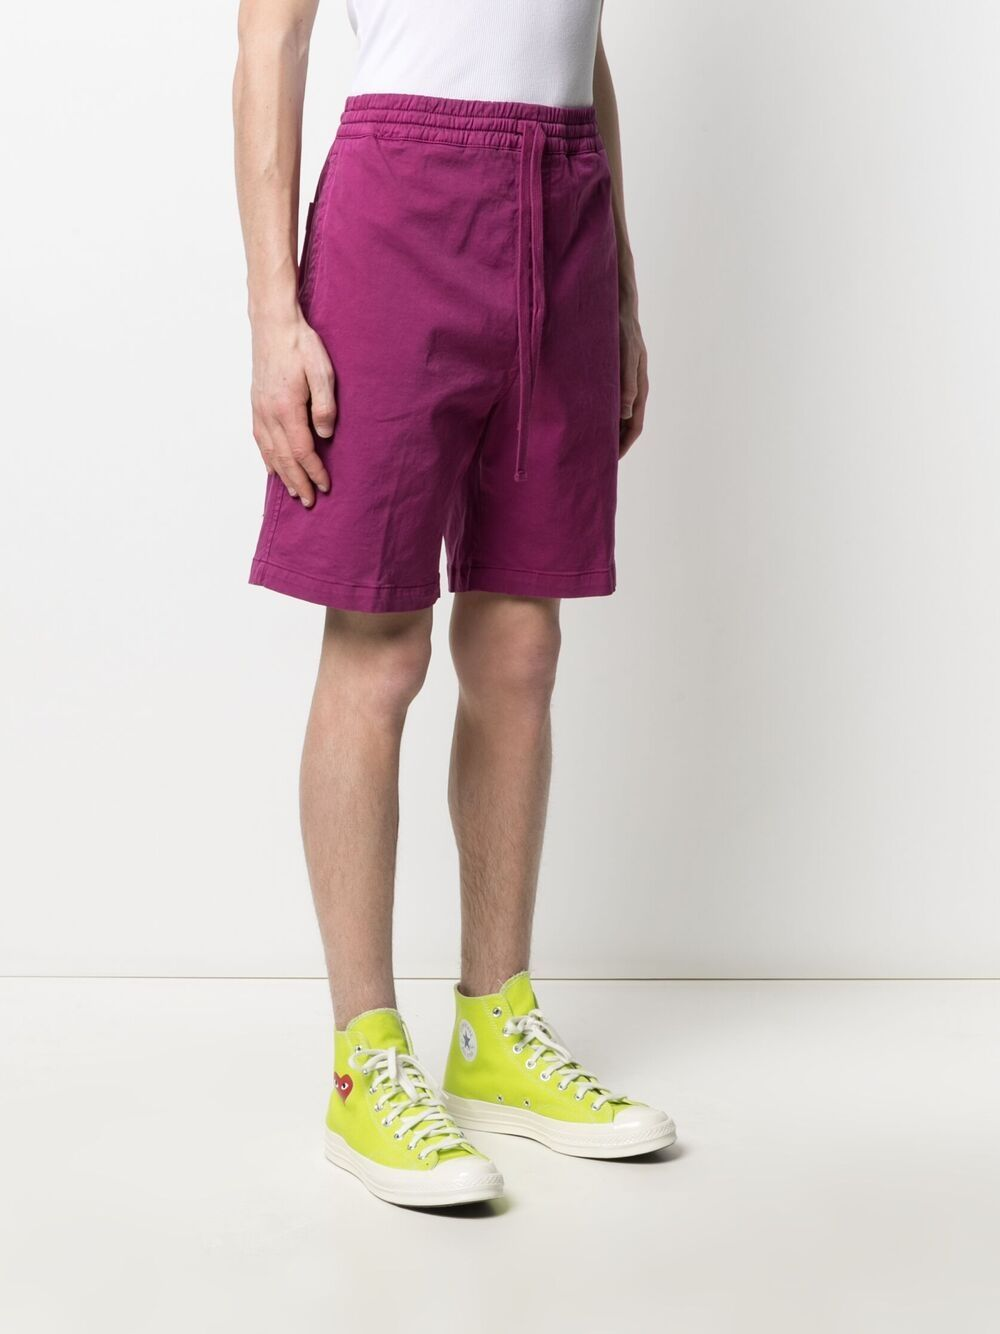 lowton shorts man pink in cotton CARHARTT WIP | Shorts | I0265180AP.GD